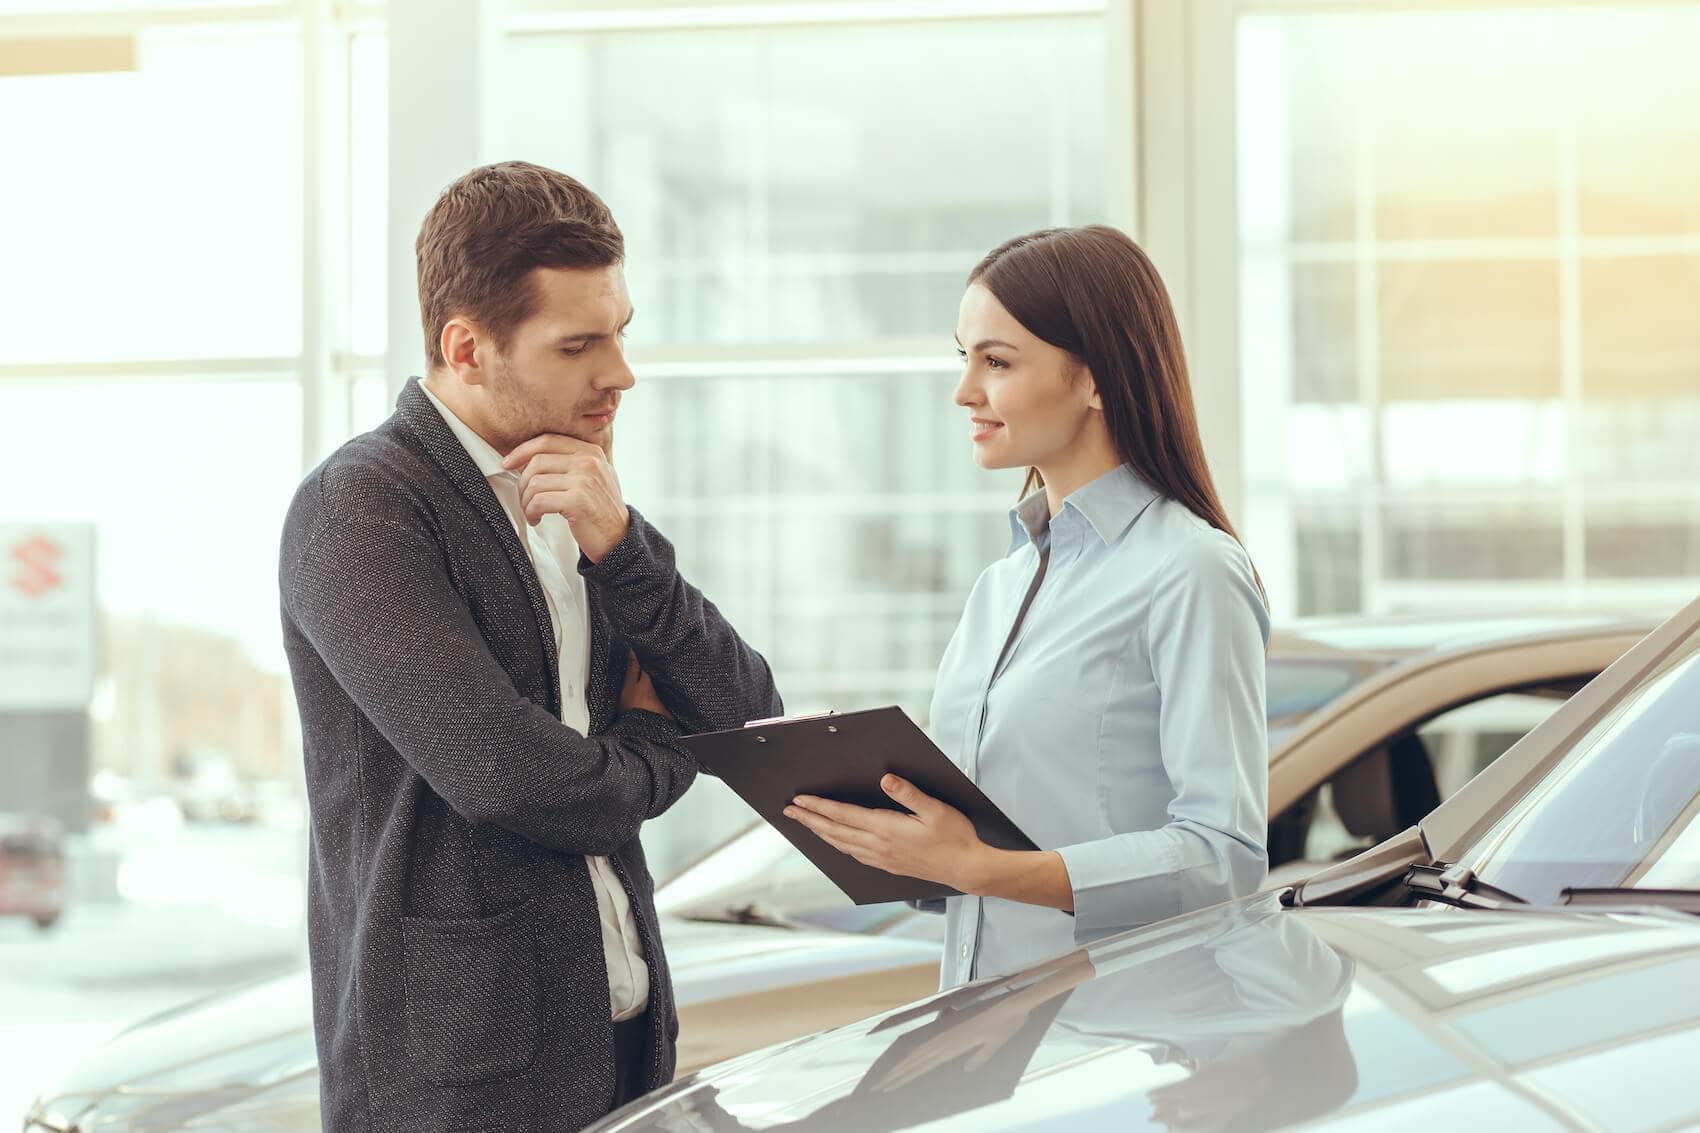 Financing an Acura MDX near Atlantic City